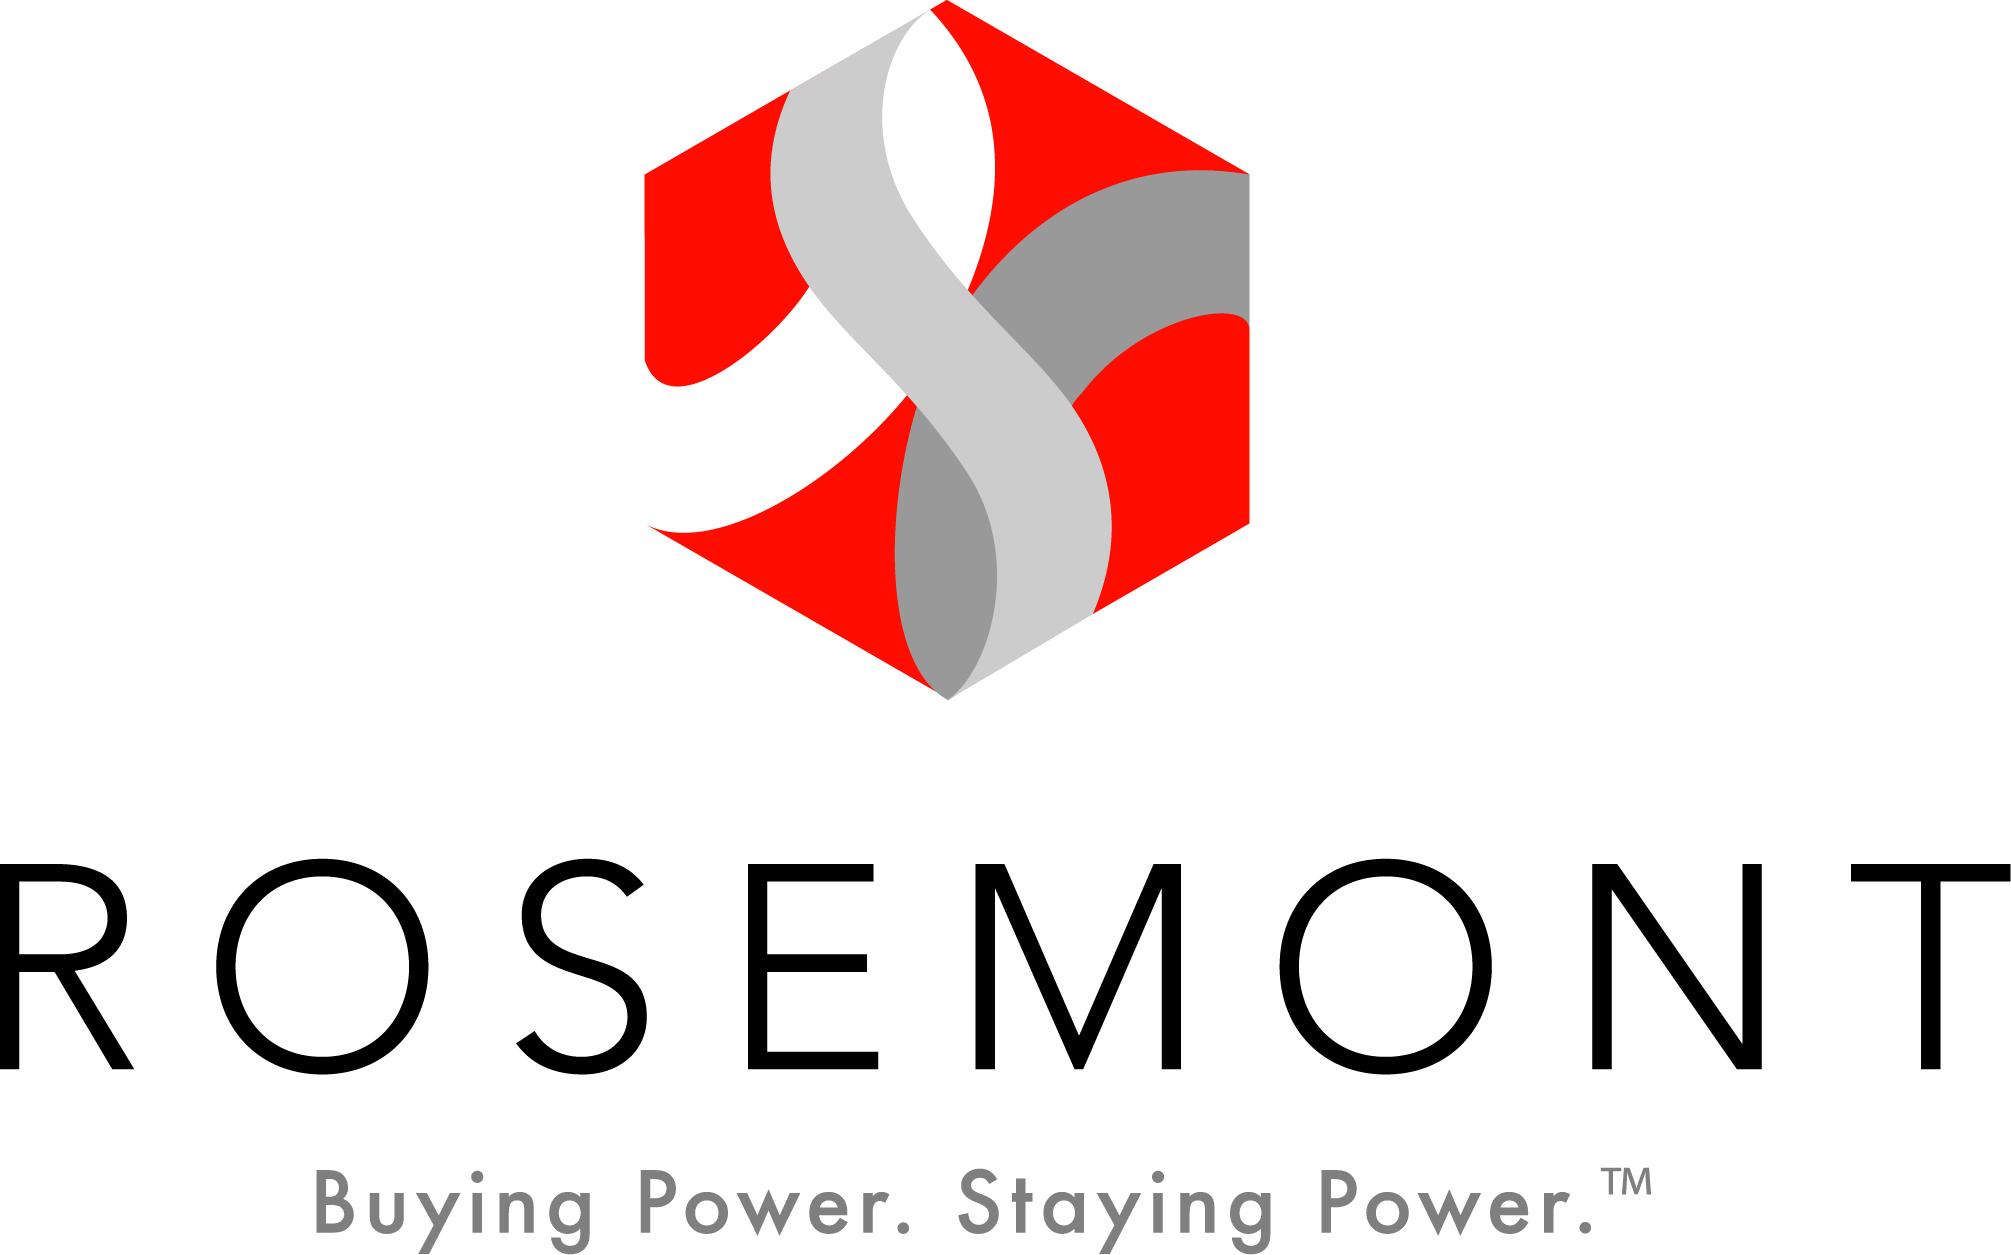 tcg_mkt_logos_rosemont.jpg